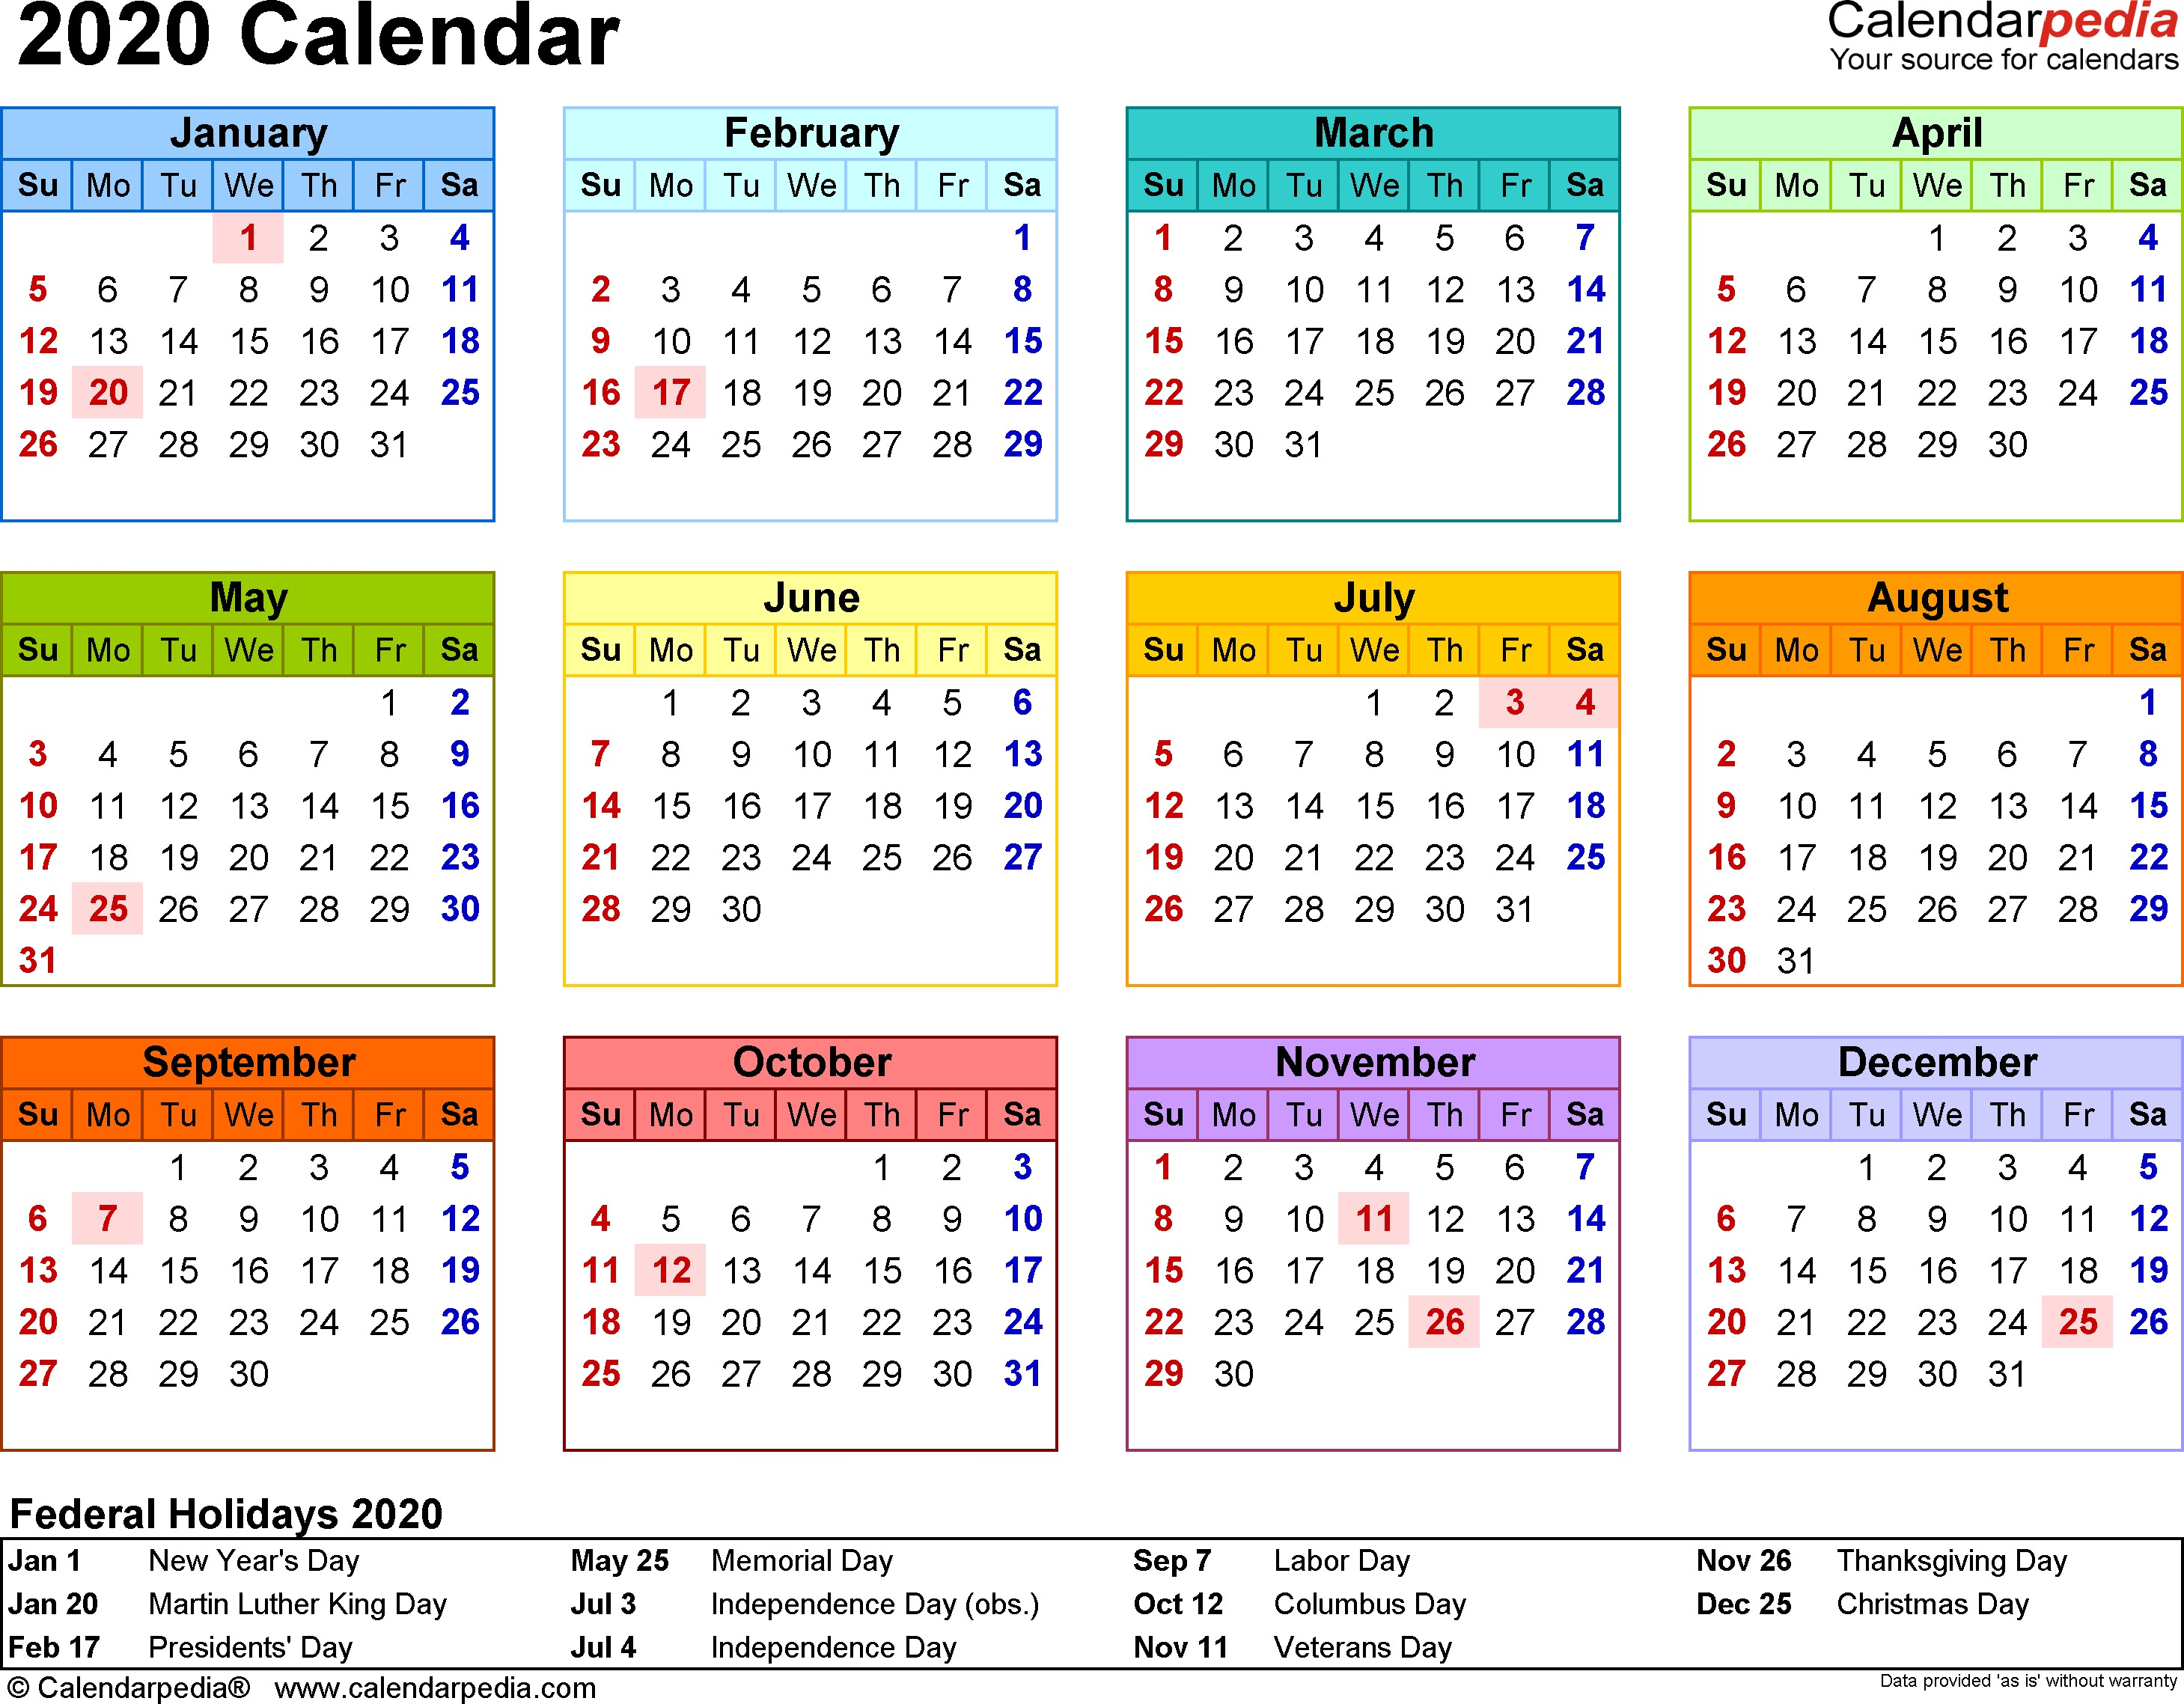 Free Online Printable Calendar 2020 2020 Calendar Download 17 Free Printable Excel Templates